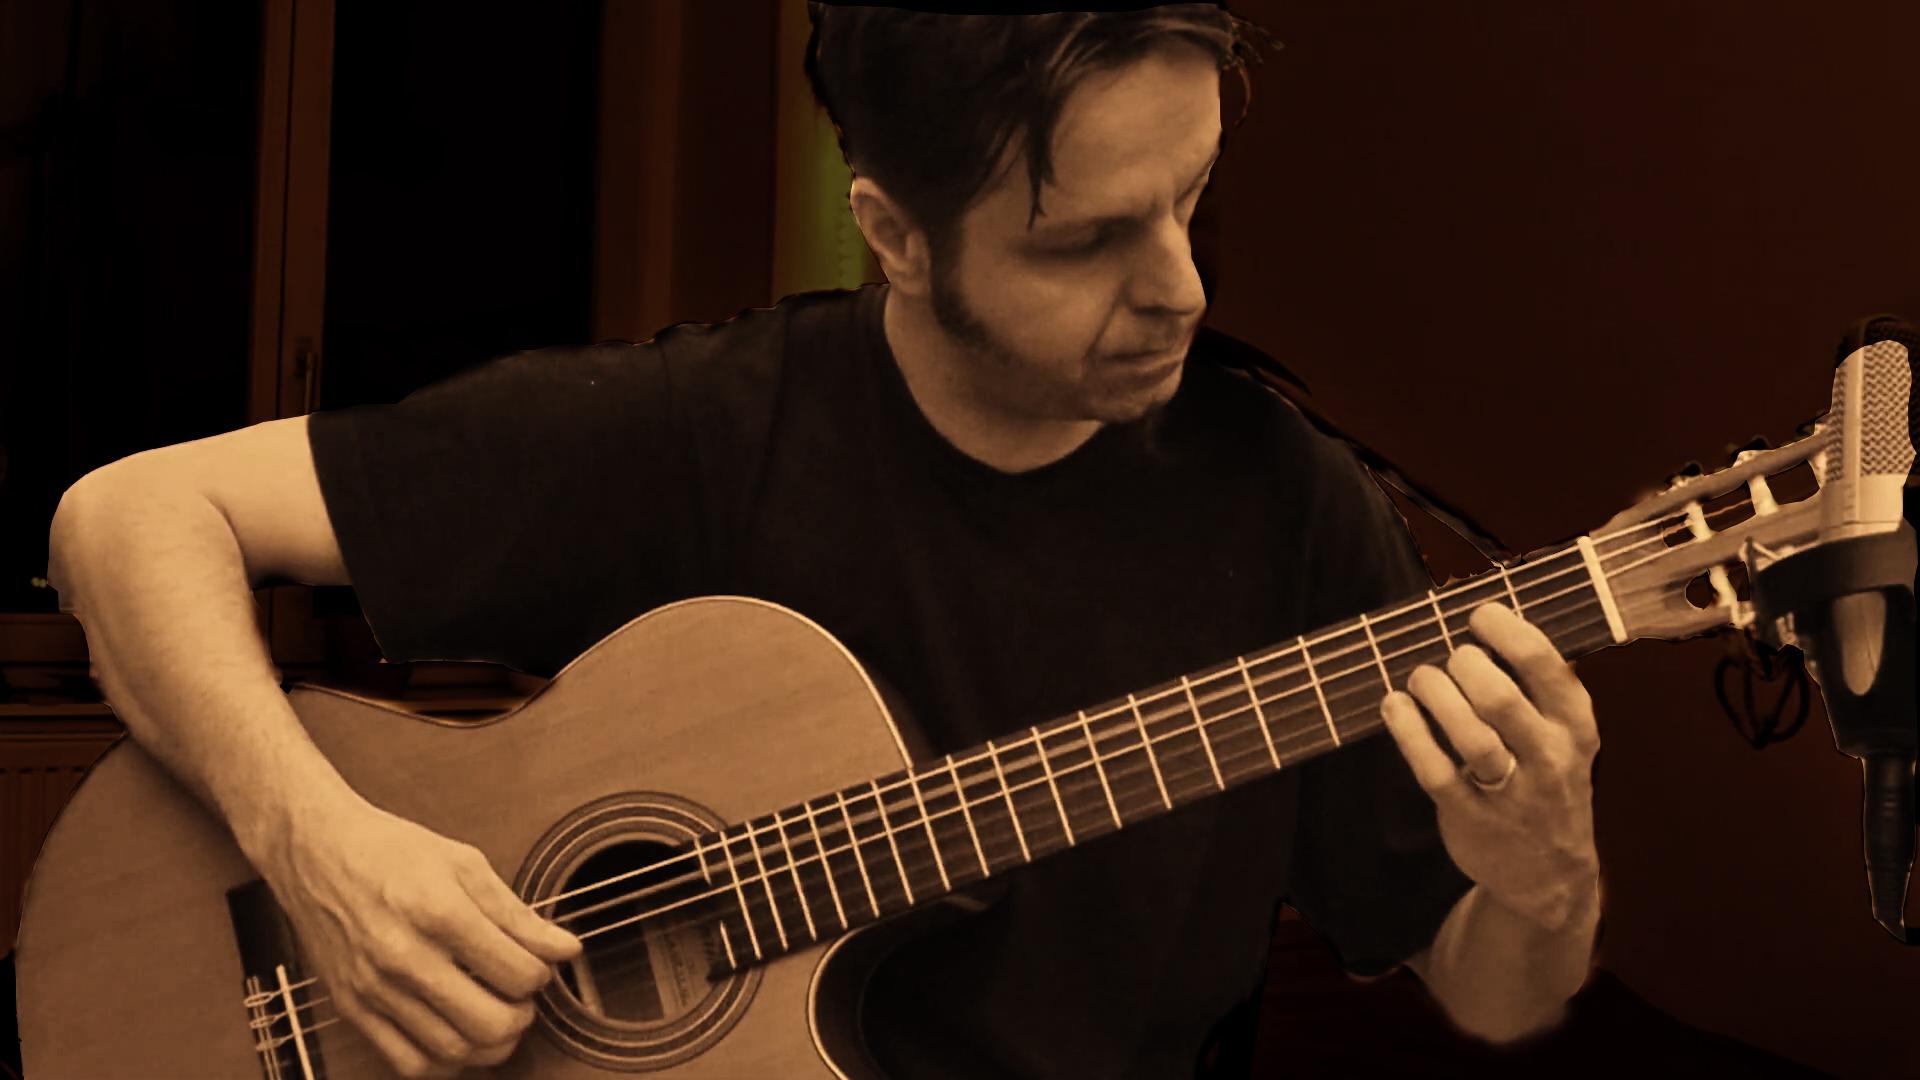 Chono Gitarre